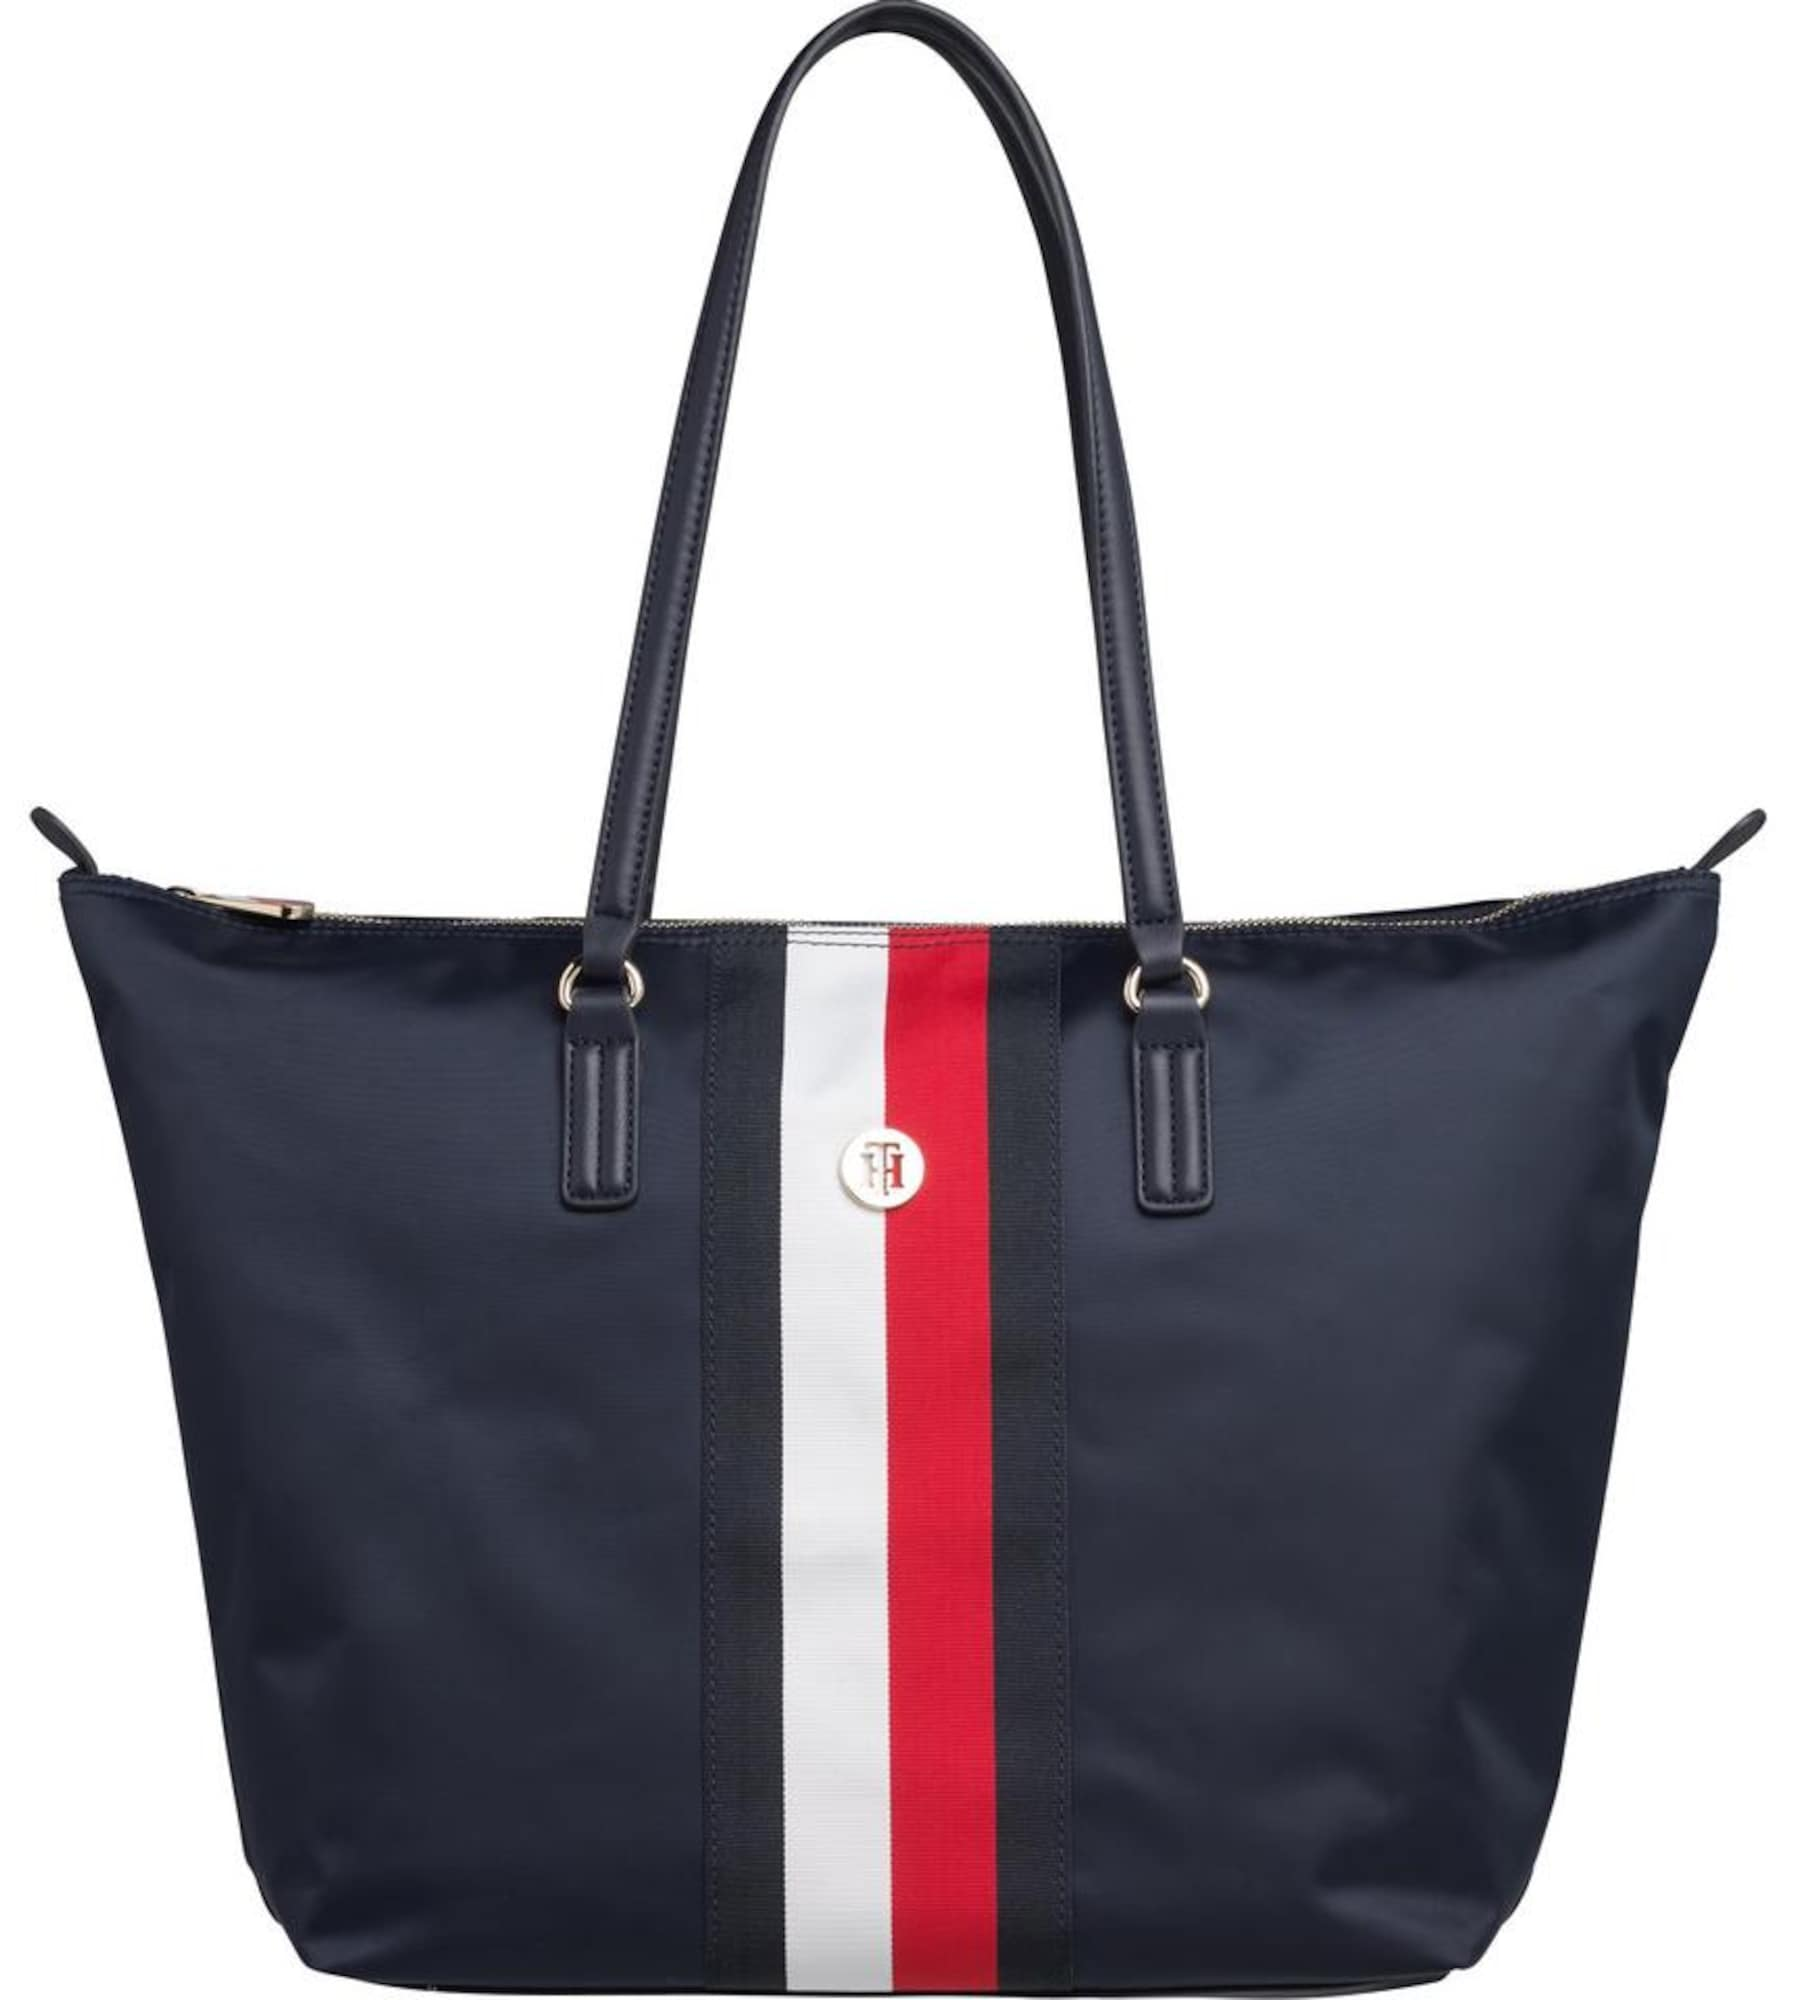 TOMMY HILFIGER Pirkinių krepšys tamsiai mėlyna / raudona / balta